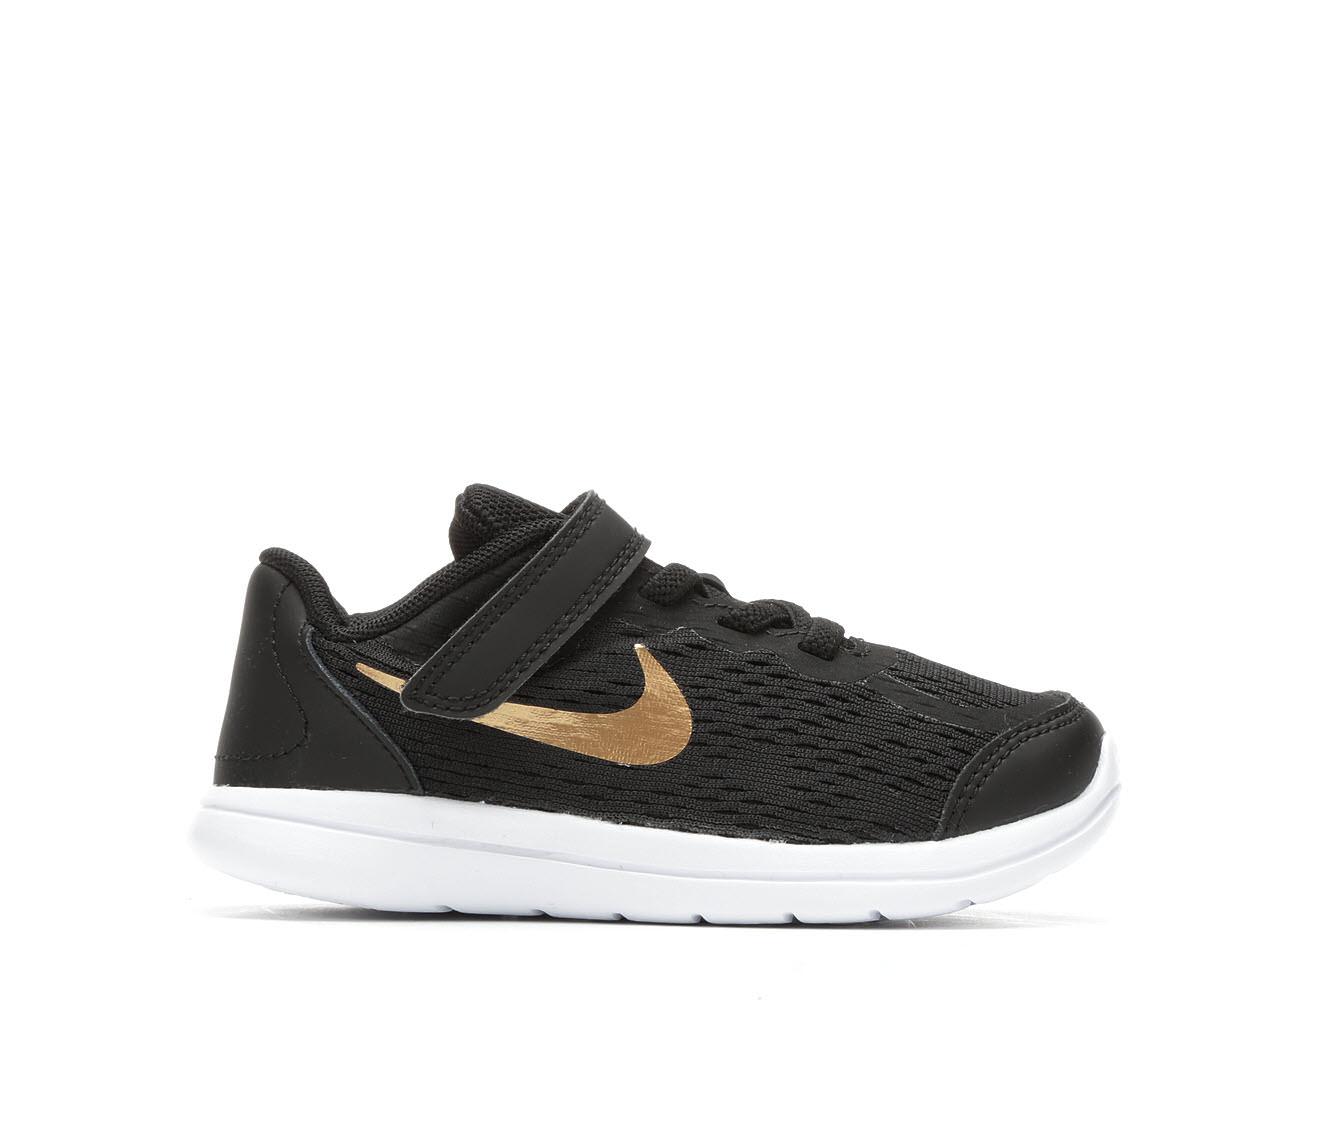 Boys' Nike Infant Flex RN 2017 Sneakers (Black)